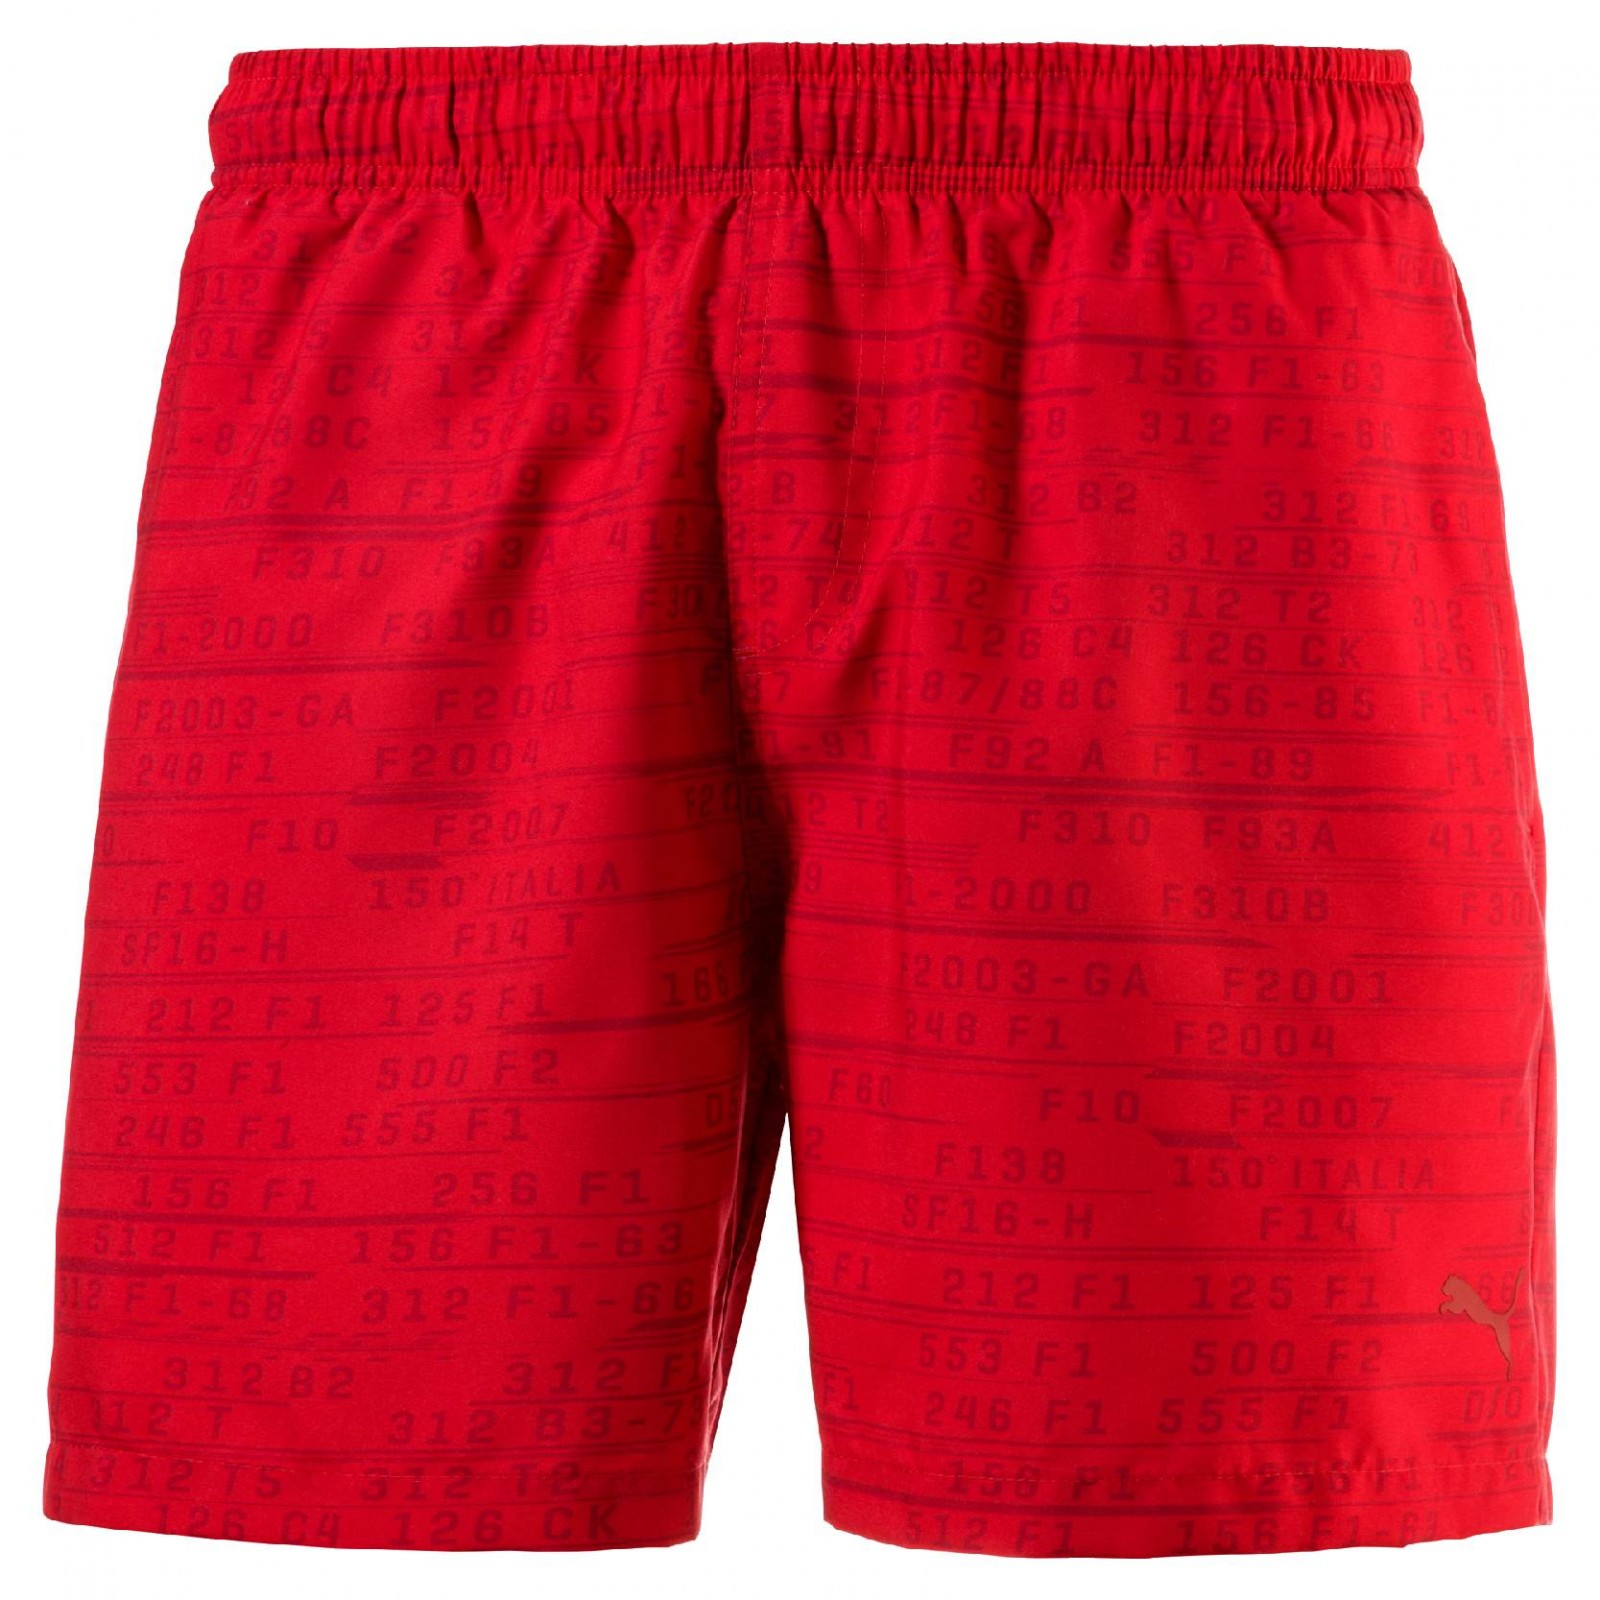 3cda4b15eb71 Pánské plavky Puma Ferrari Ferrari Swim Shorts Rosso Cors